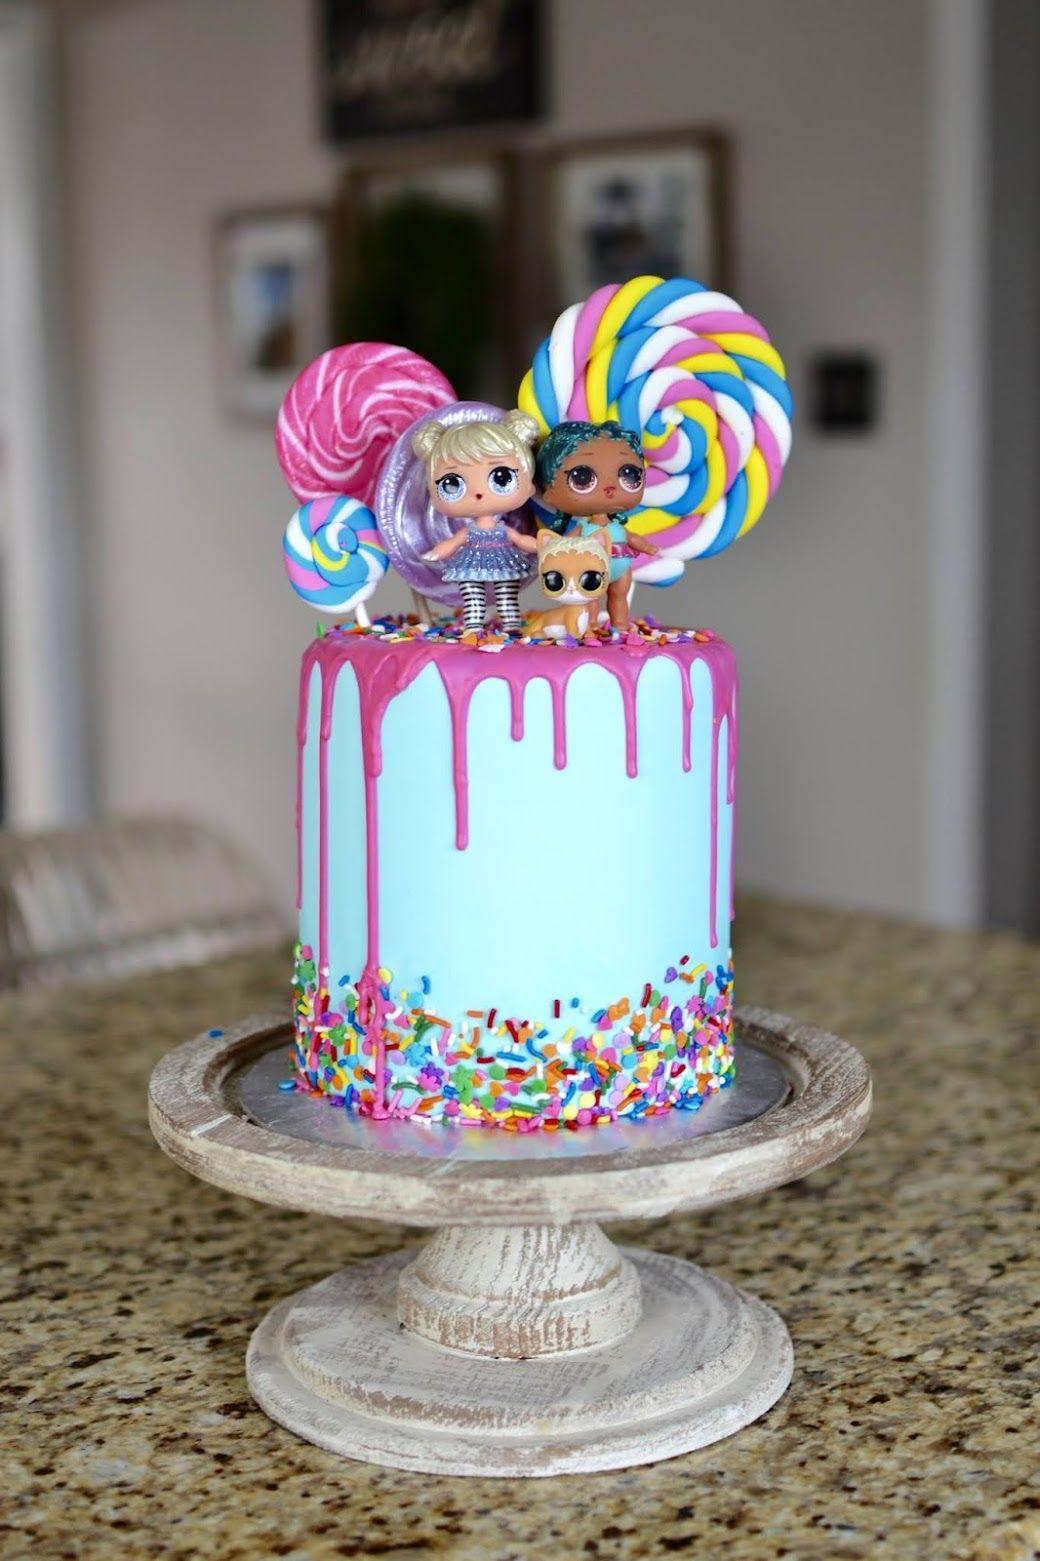 Emme S Lol Surprise Birthday Party By Erika Batista Doll Birthday Cake Funny Birthday Cakes 6th Birthday Cakes